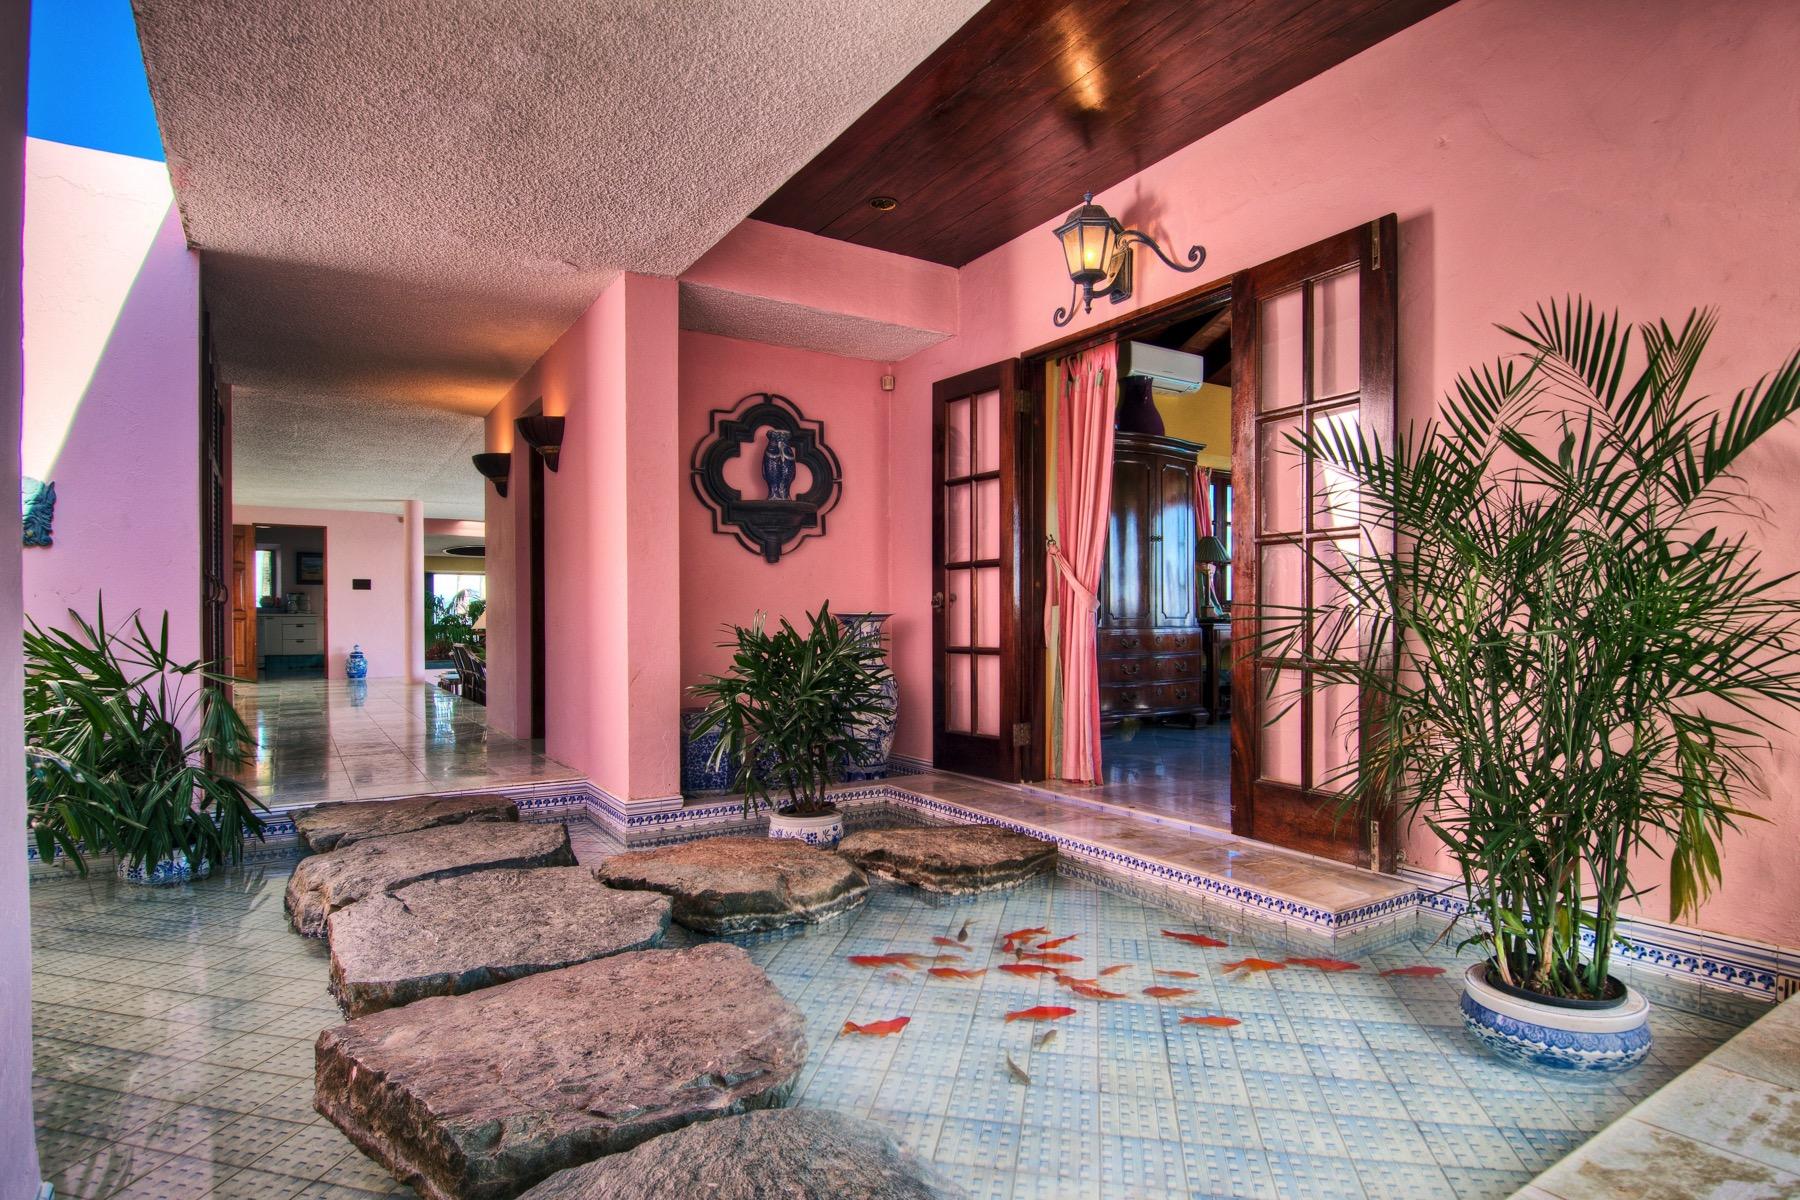 Additional photo for property listing at Rhumb House Nora Hazel Point, Tortola British Virgin Islands